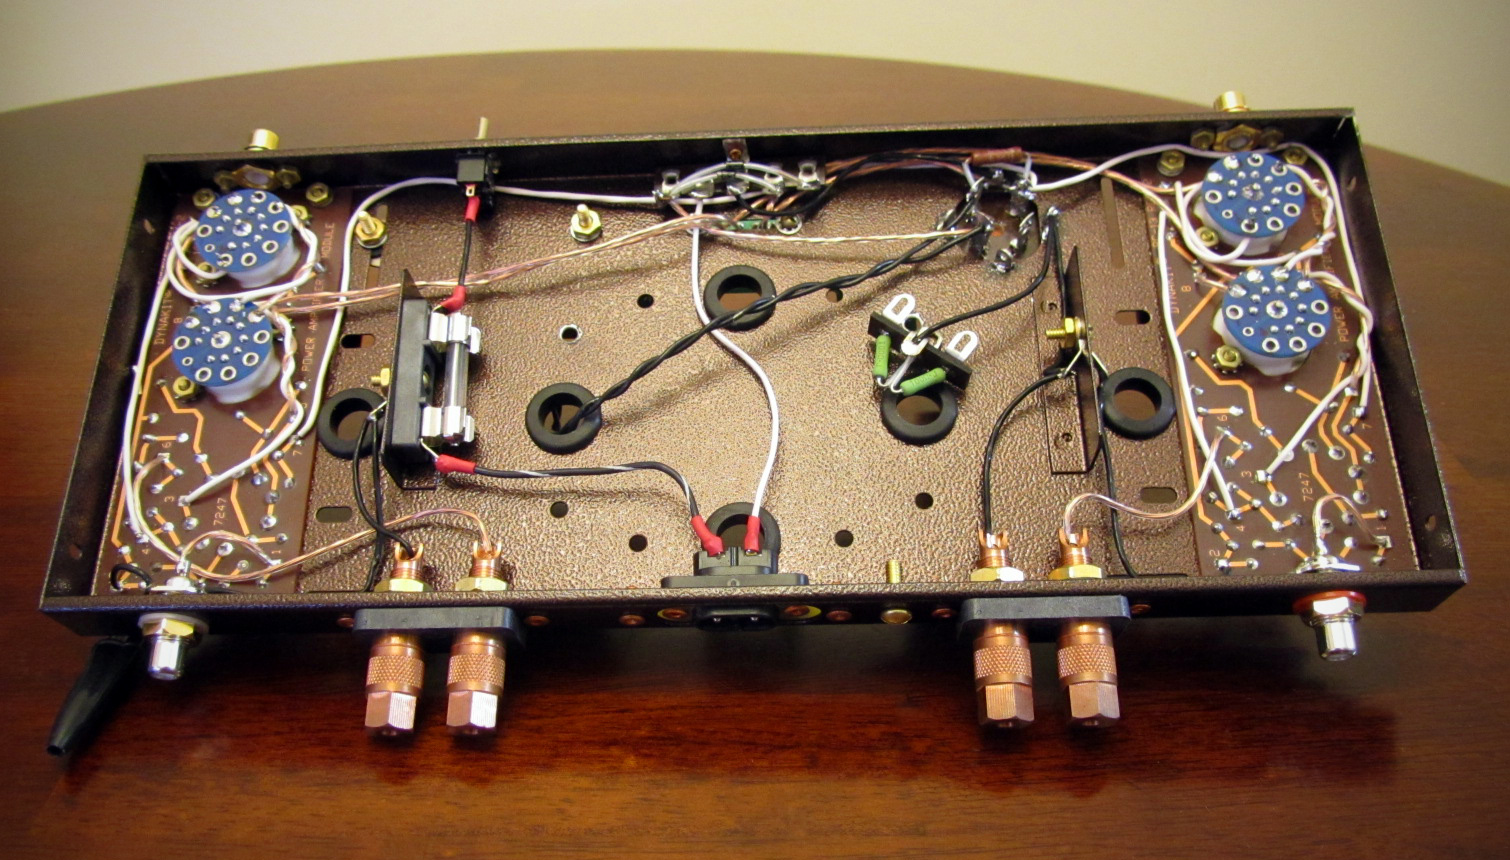 Diy Audio Electronics From Zynsonix Com  A Customized